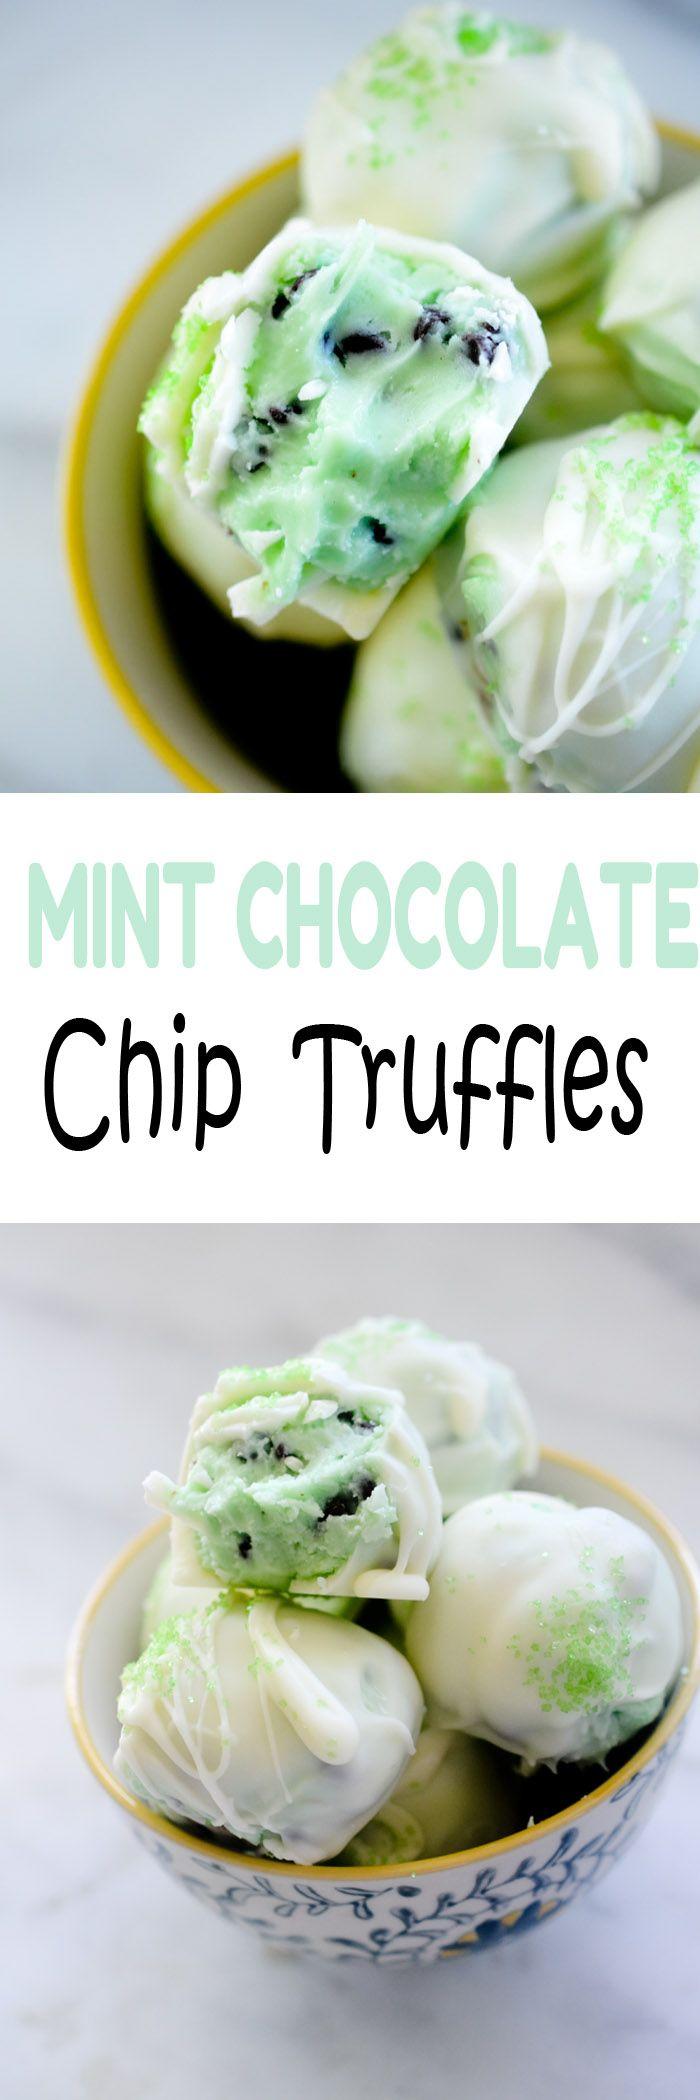 Mint Chocolate Chip Truffles - Recipe Diaries #mint